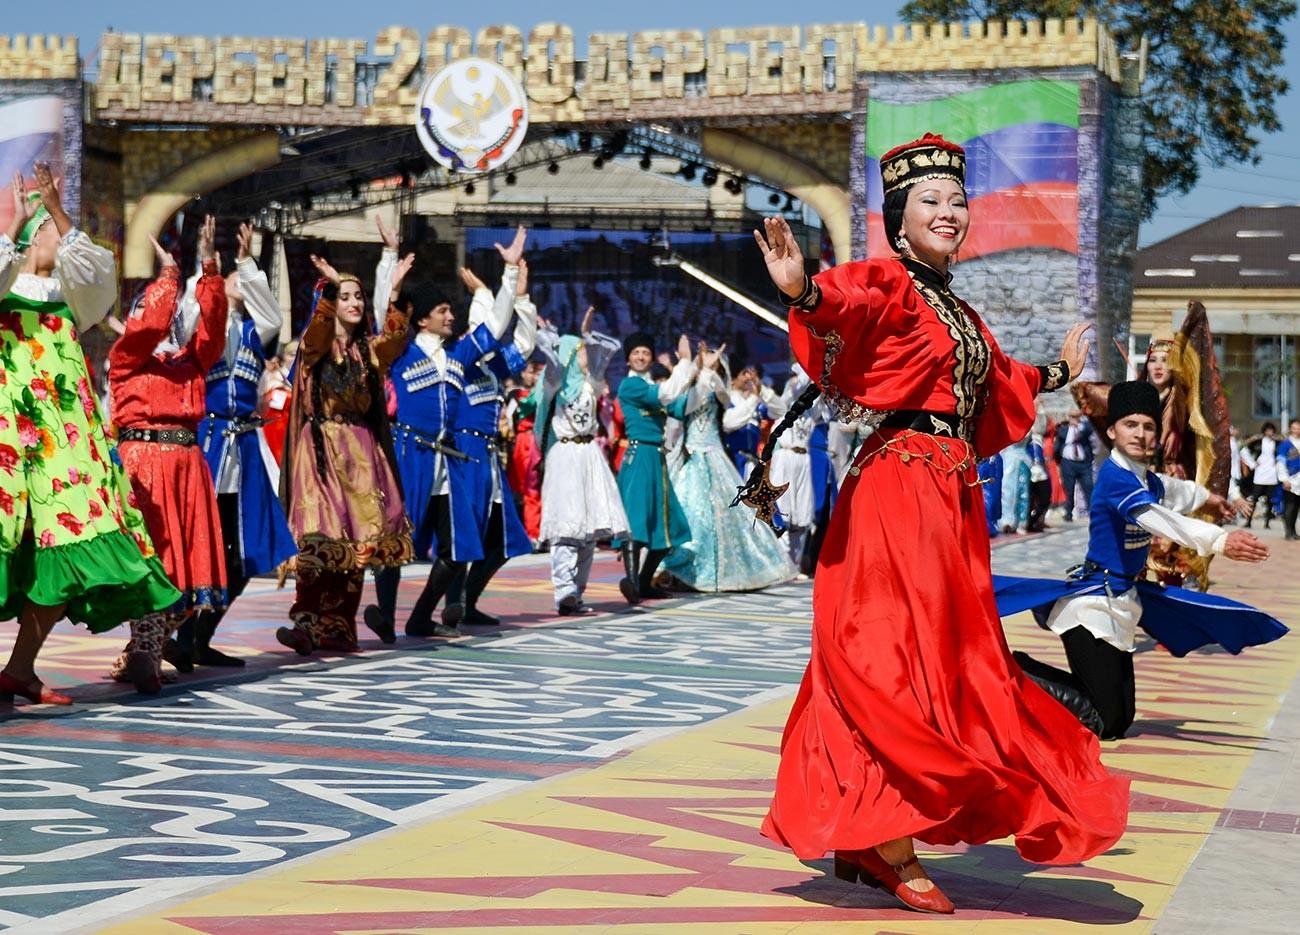 A festival of Dagestan peoples in Derbent.